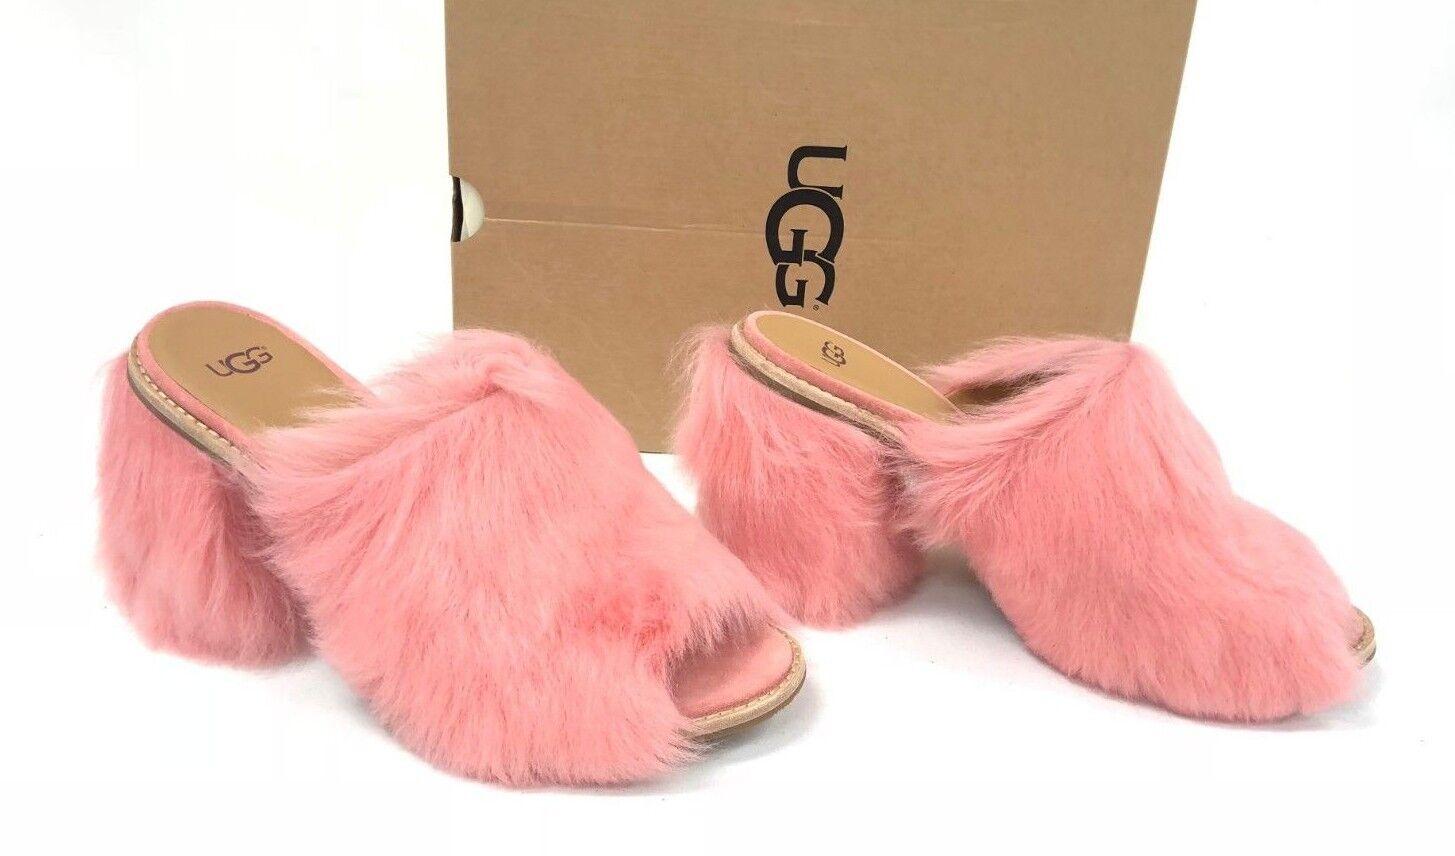 UGG Australia ROSA FLUFF Lantana Pink TOSCANA SHEEPSKIN HEELS WOMEN'S 1095390